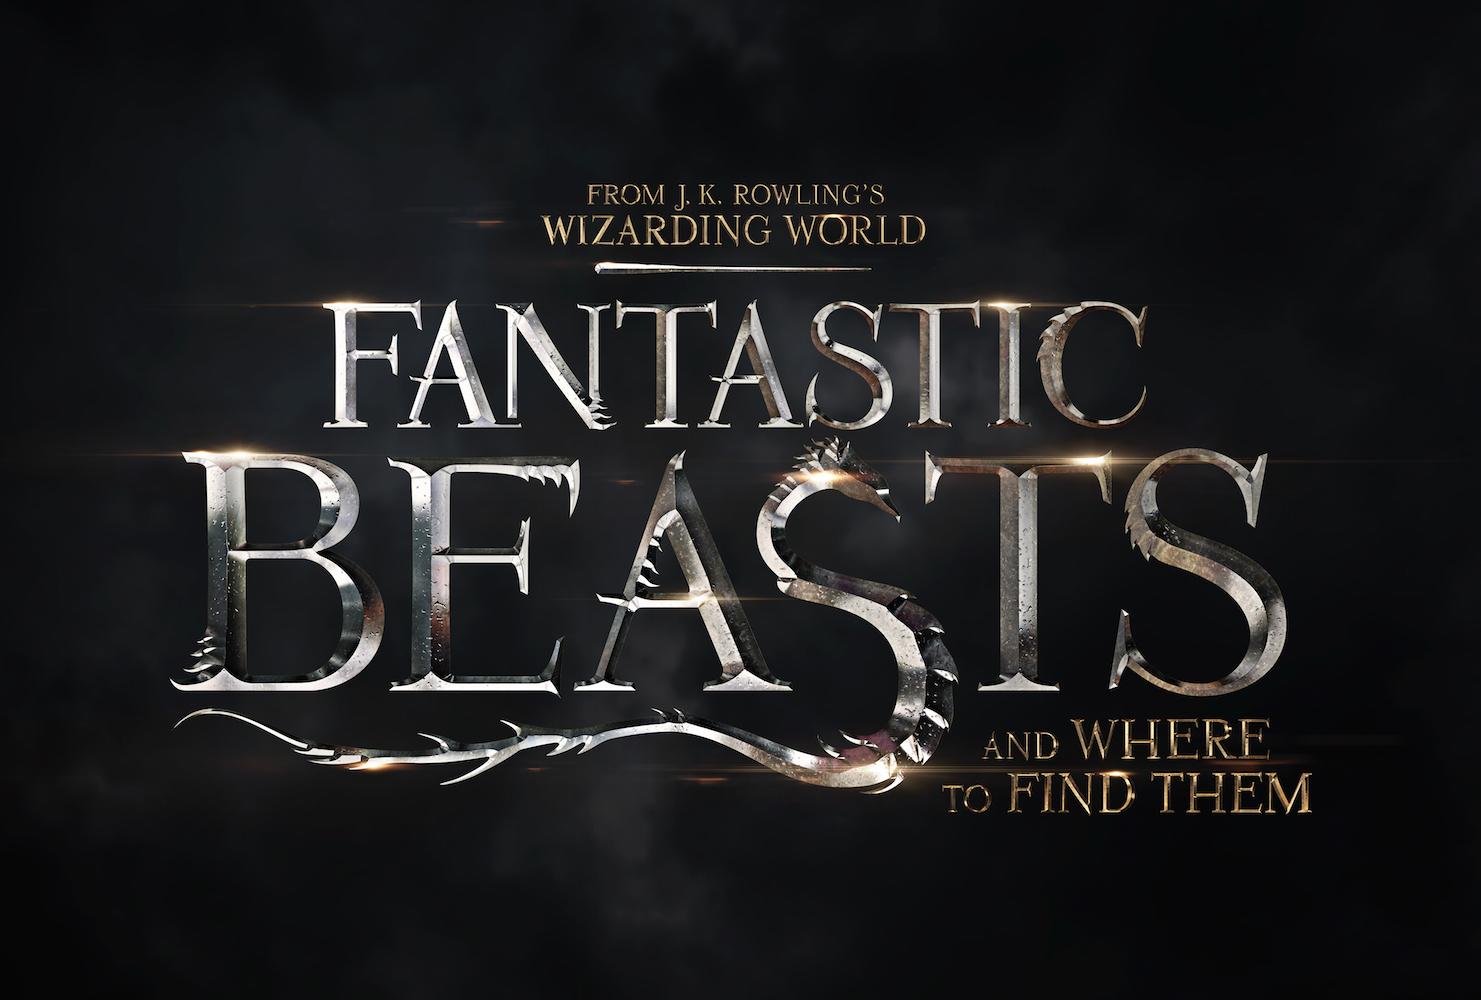 Image courtesy Warner Bros.